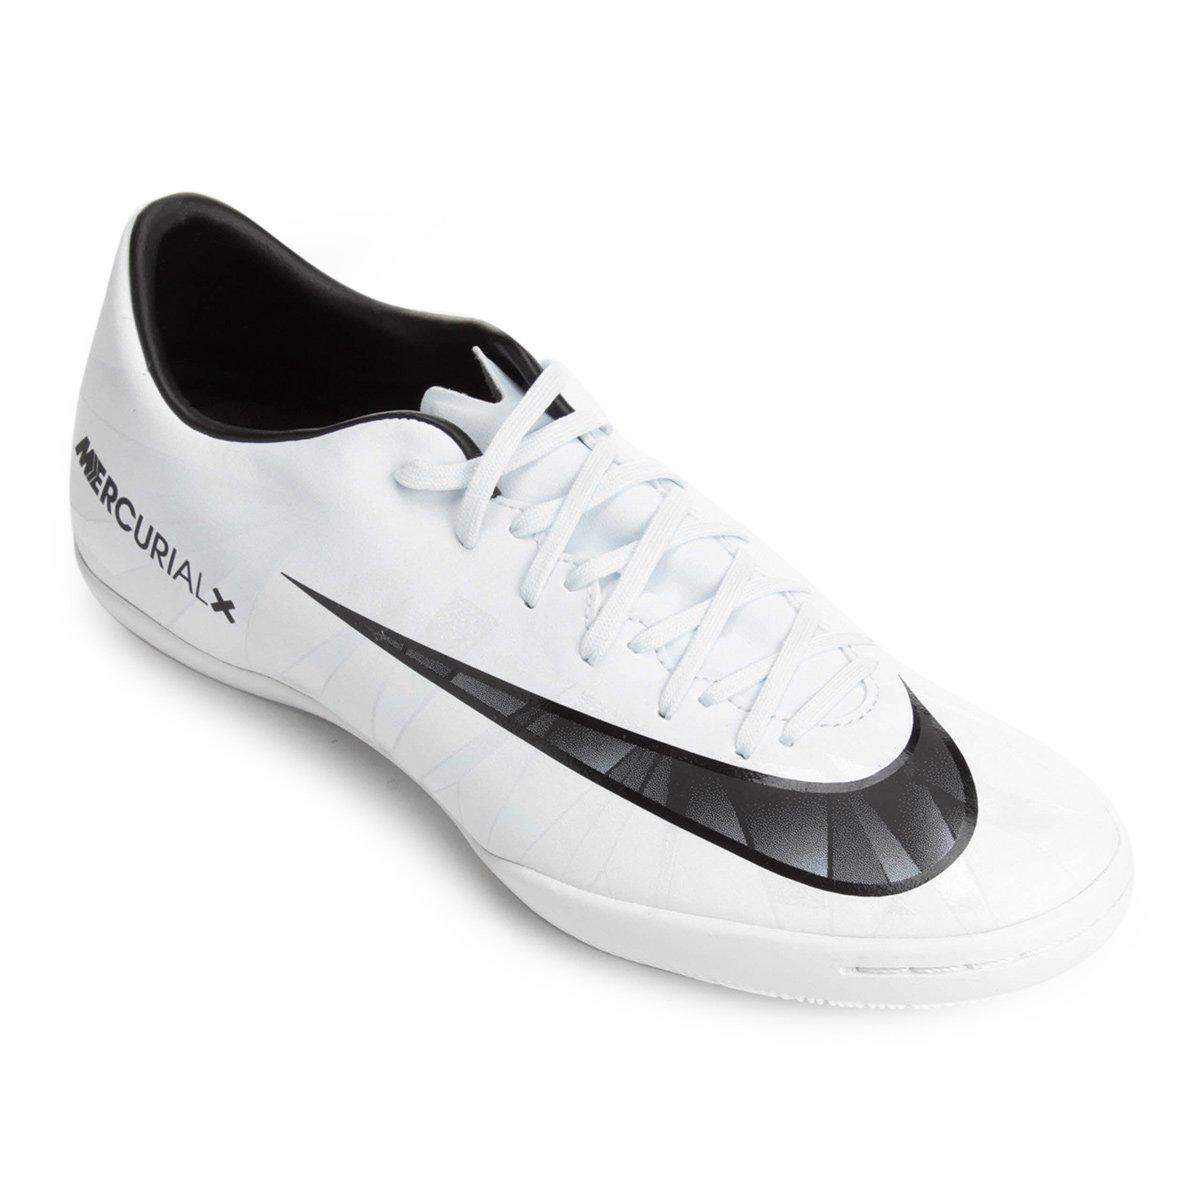 f684ef7c8d61b Chuteira Futsal Nike Mercurial X Victory 6 CR7 IC - Compre Agora ...